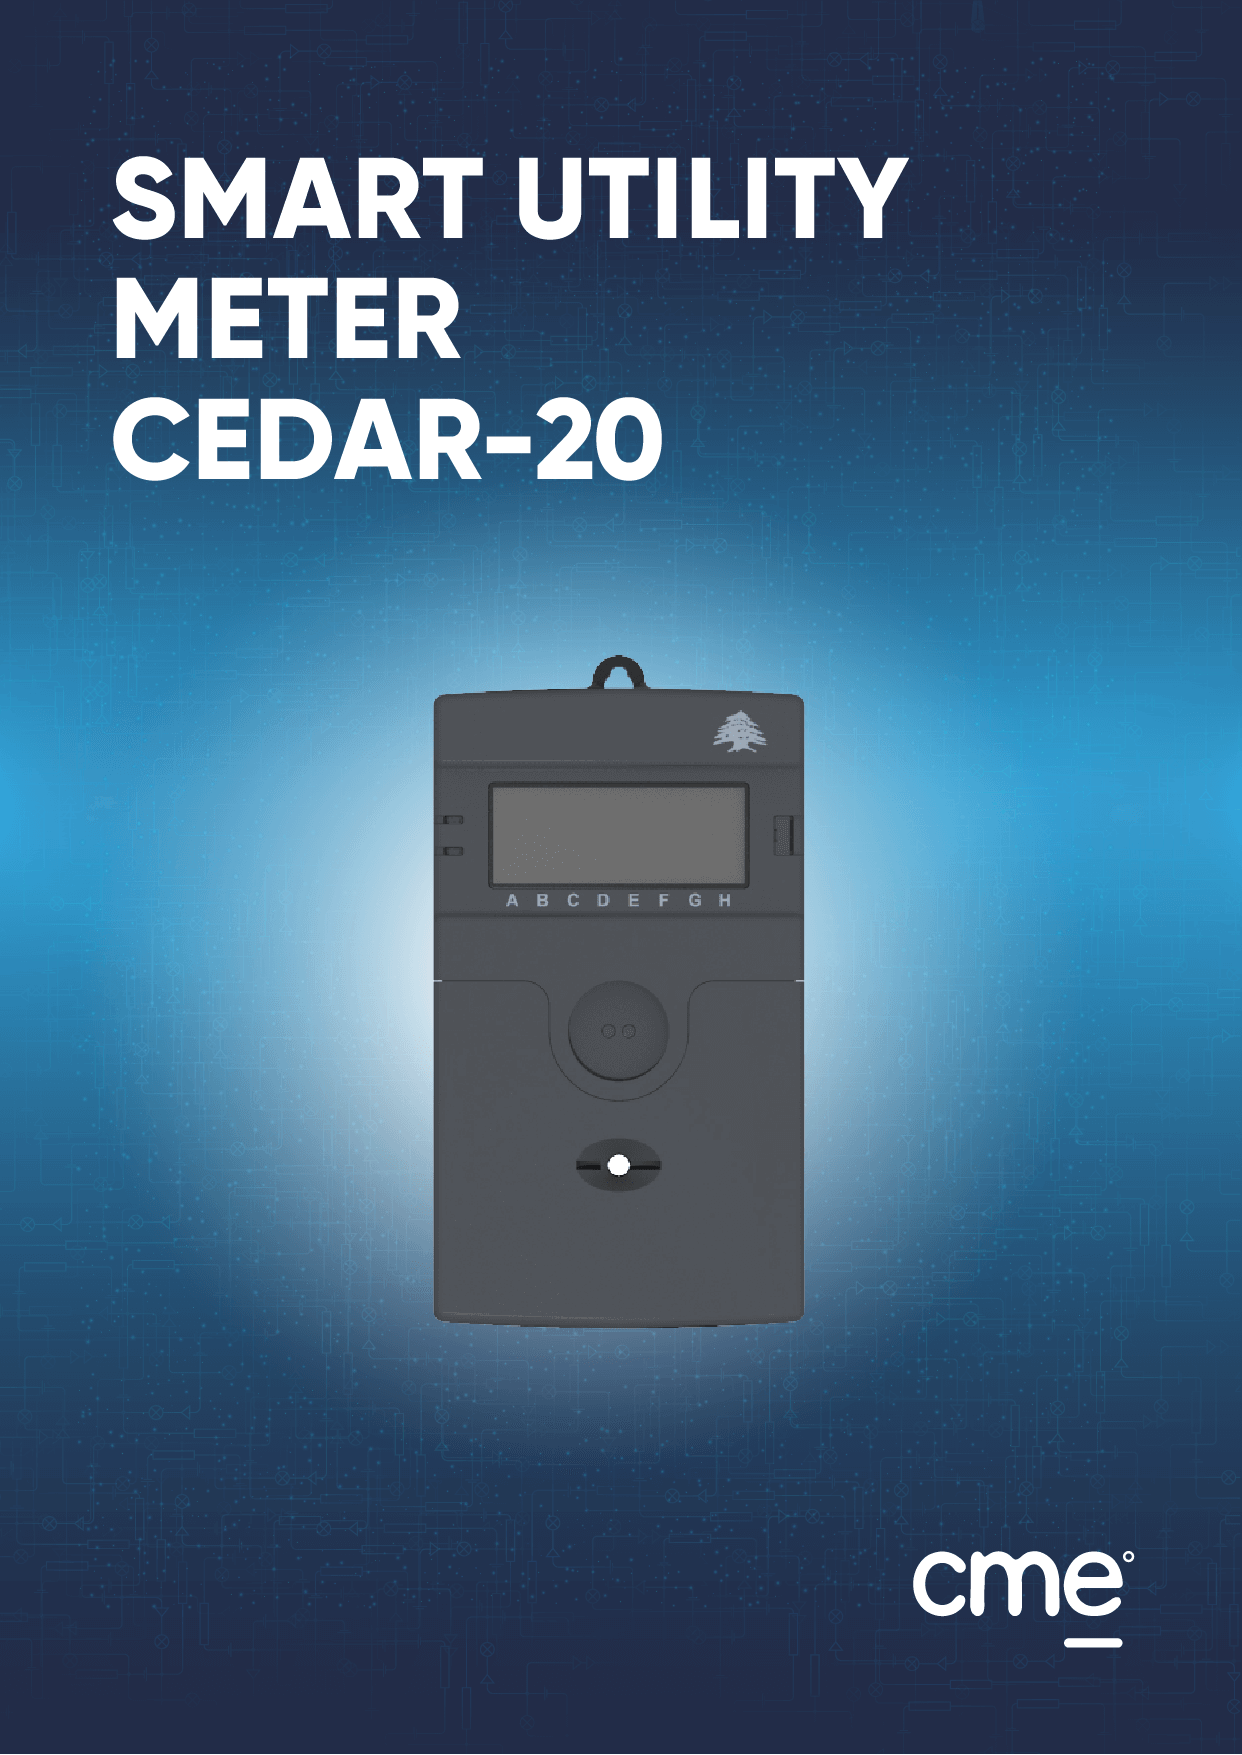 Smart utility Meter Cedar-20